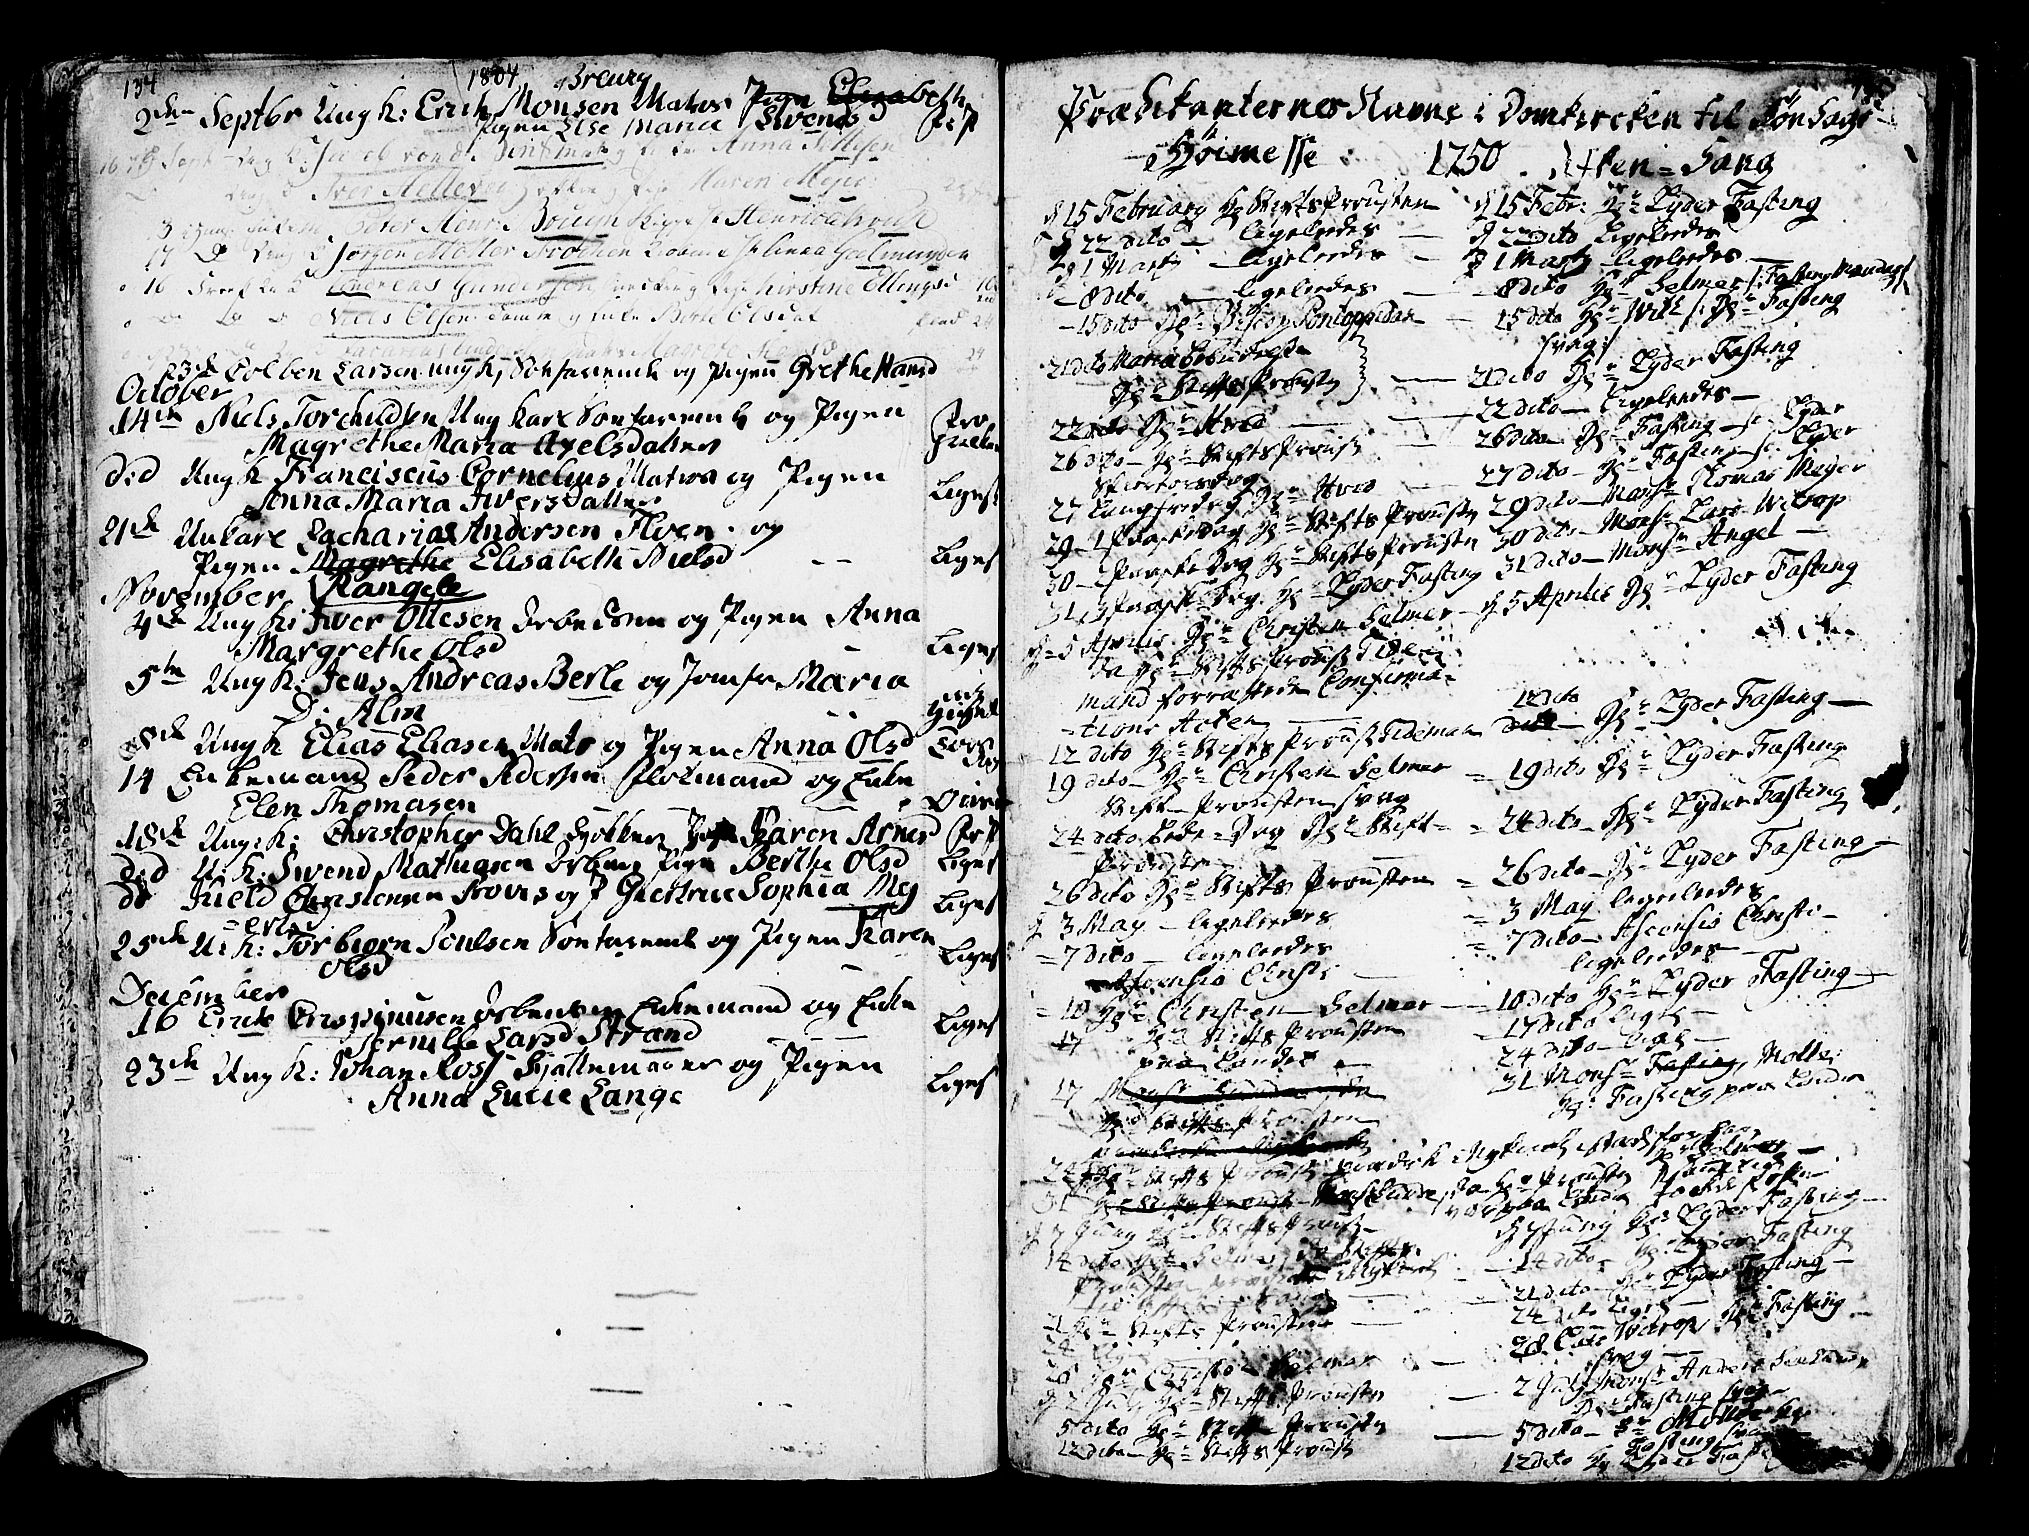 SAB, Domkirken Sokneprestembete, H/Haa/L0007: Ministerialbok nr. A 7, 1725-1826, s. 134-135